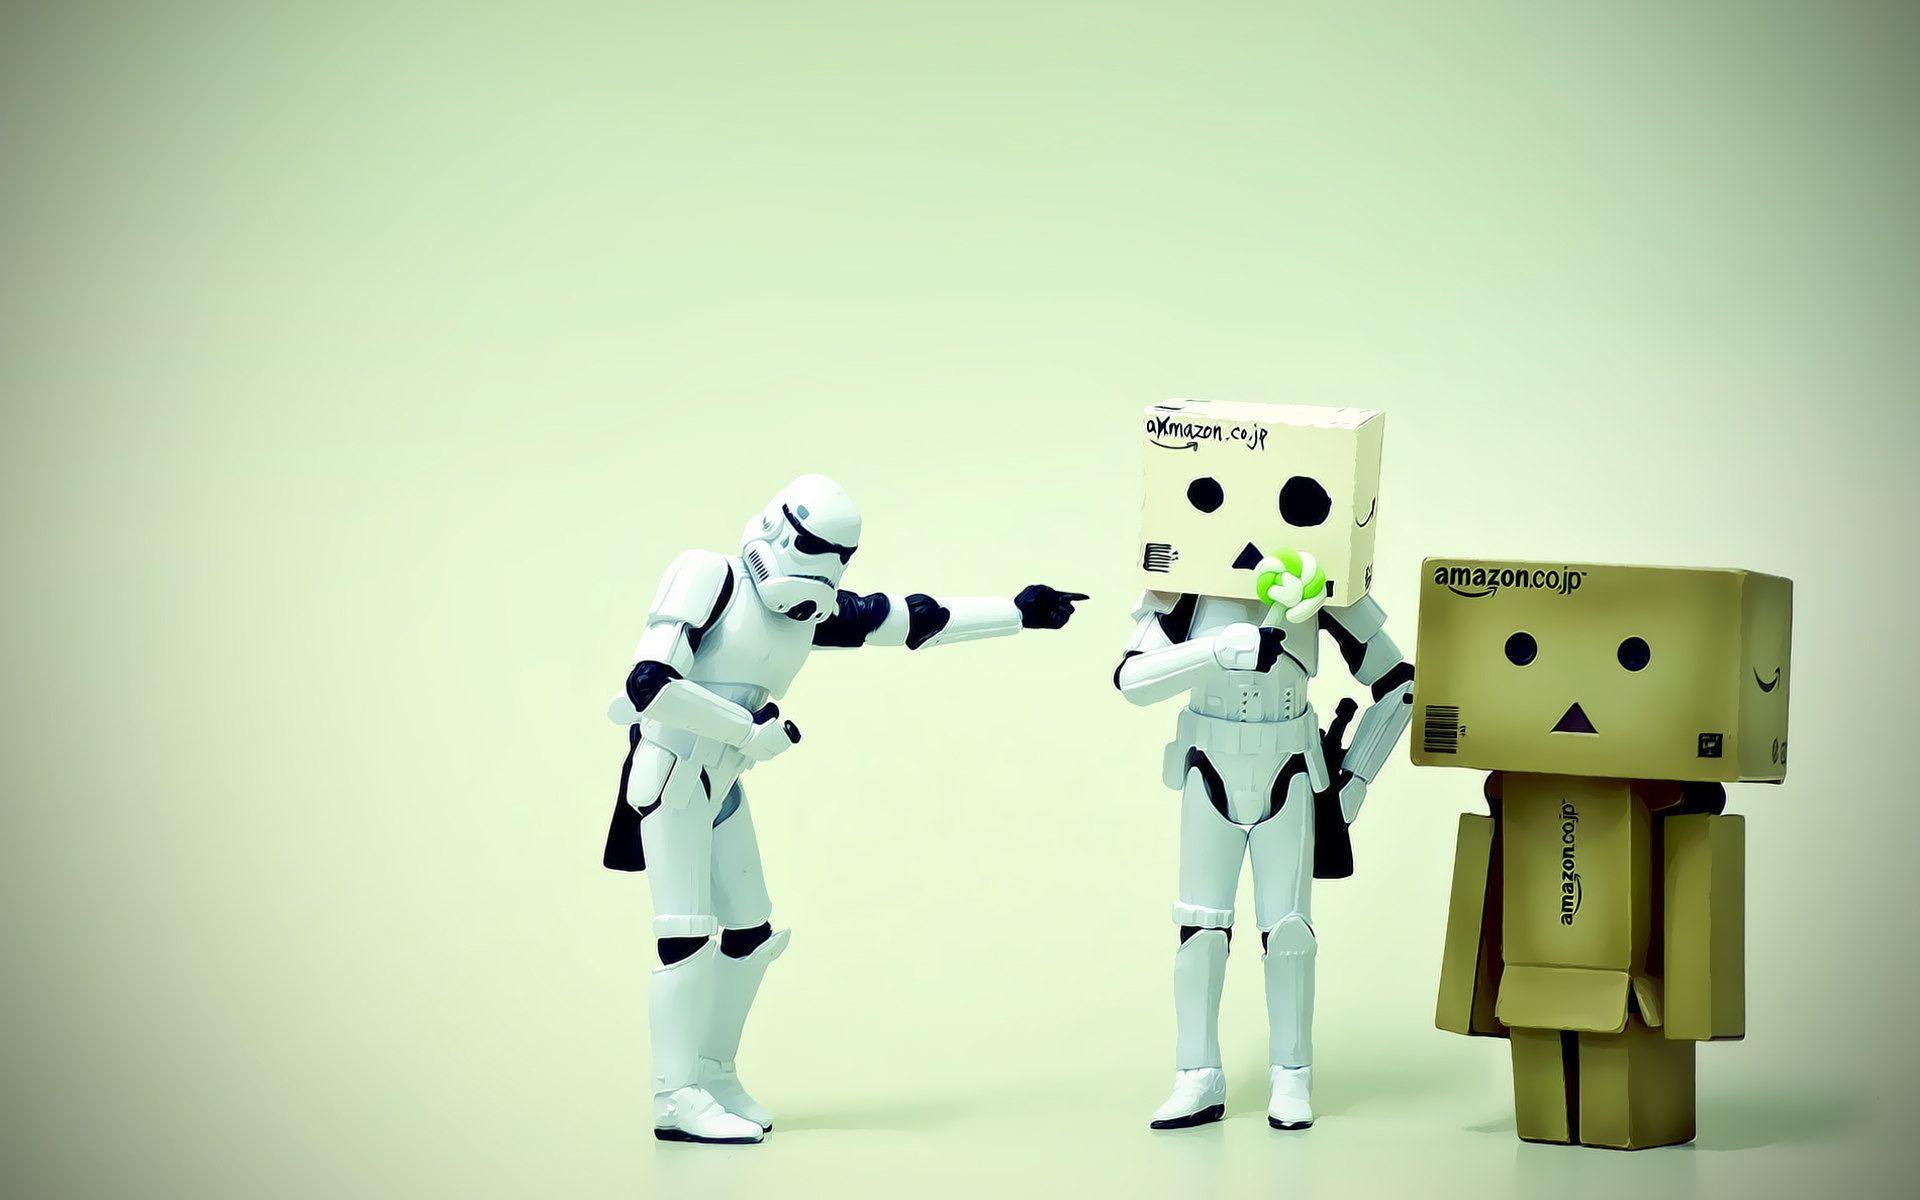 Stormtrooper Danboard! | Danboard | Danbo, Cardboard robot, Table lamp